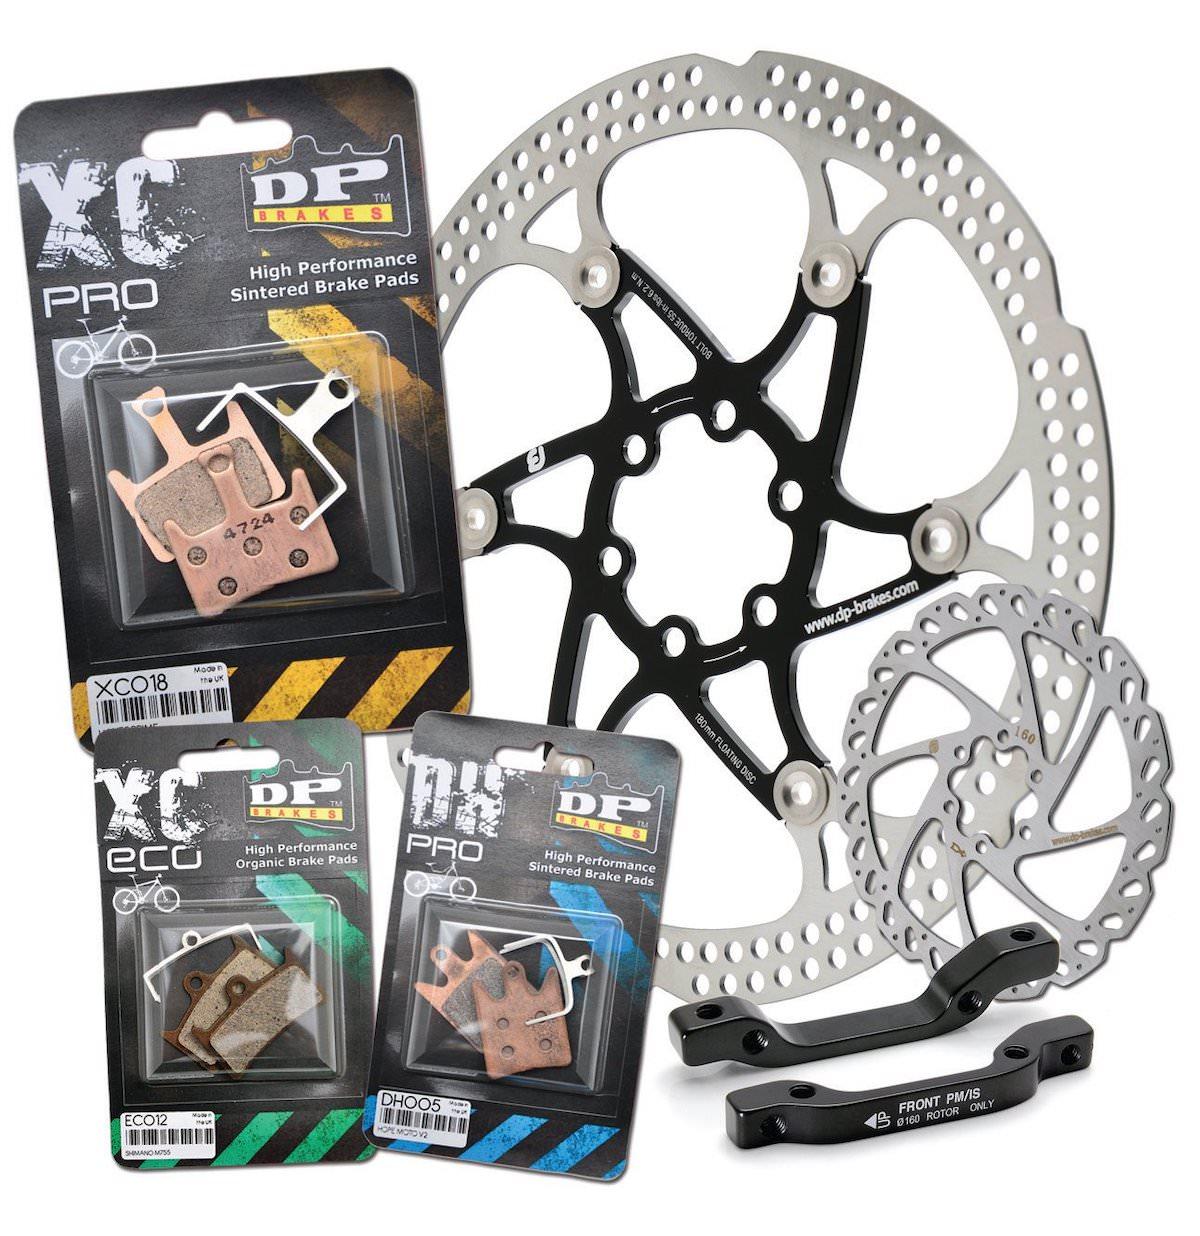 dp-brakes-parts-equipment